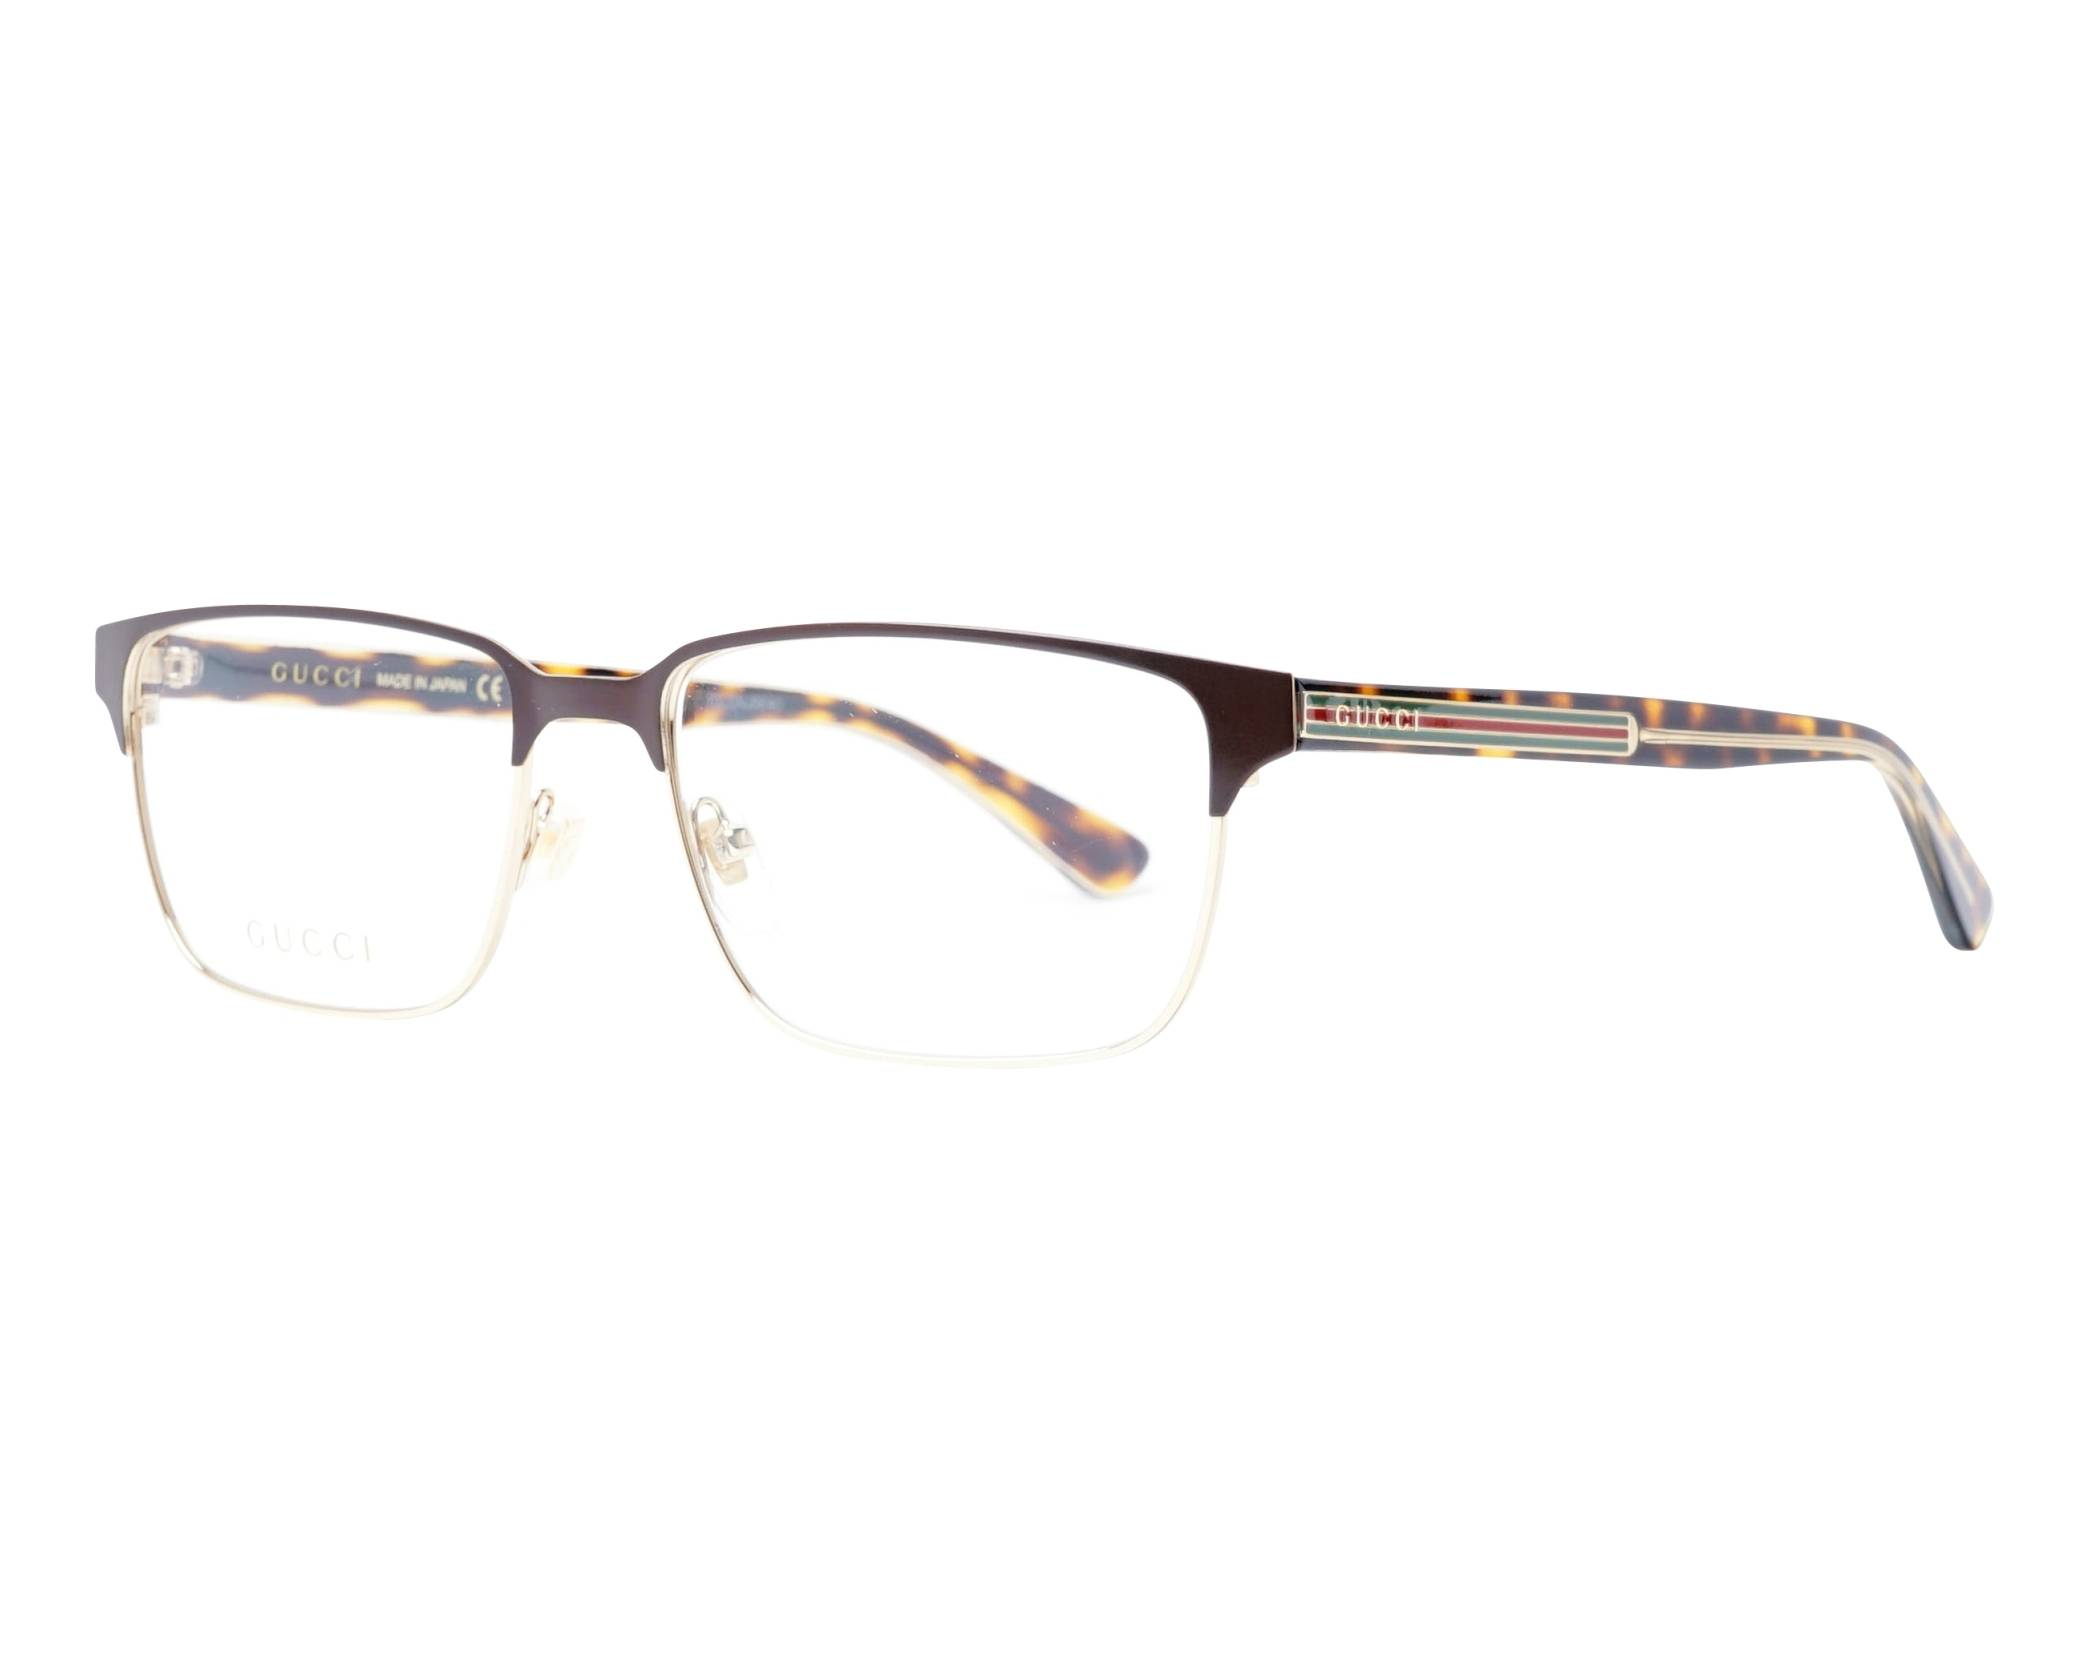 e603cf729dca7 eyeglasses Gucci GG-0383-O 005 58-17 Brown Gold profile view